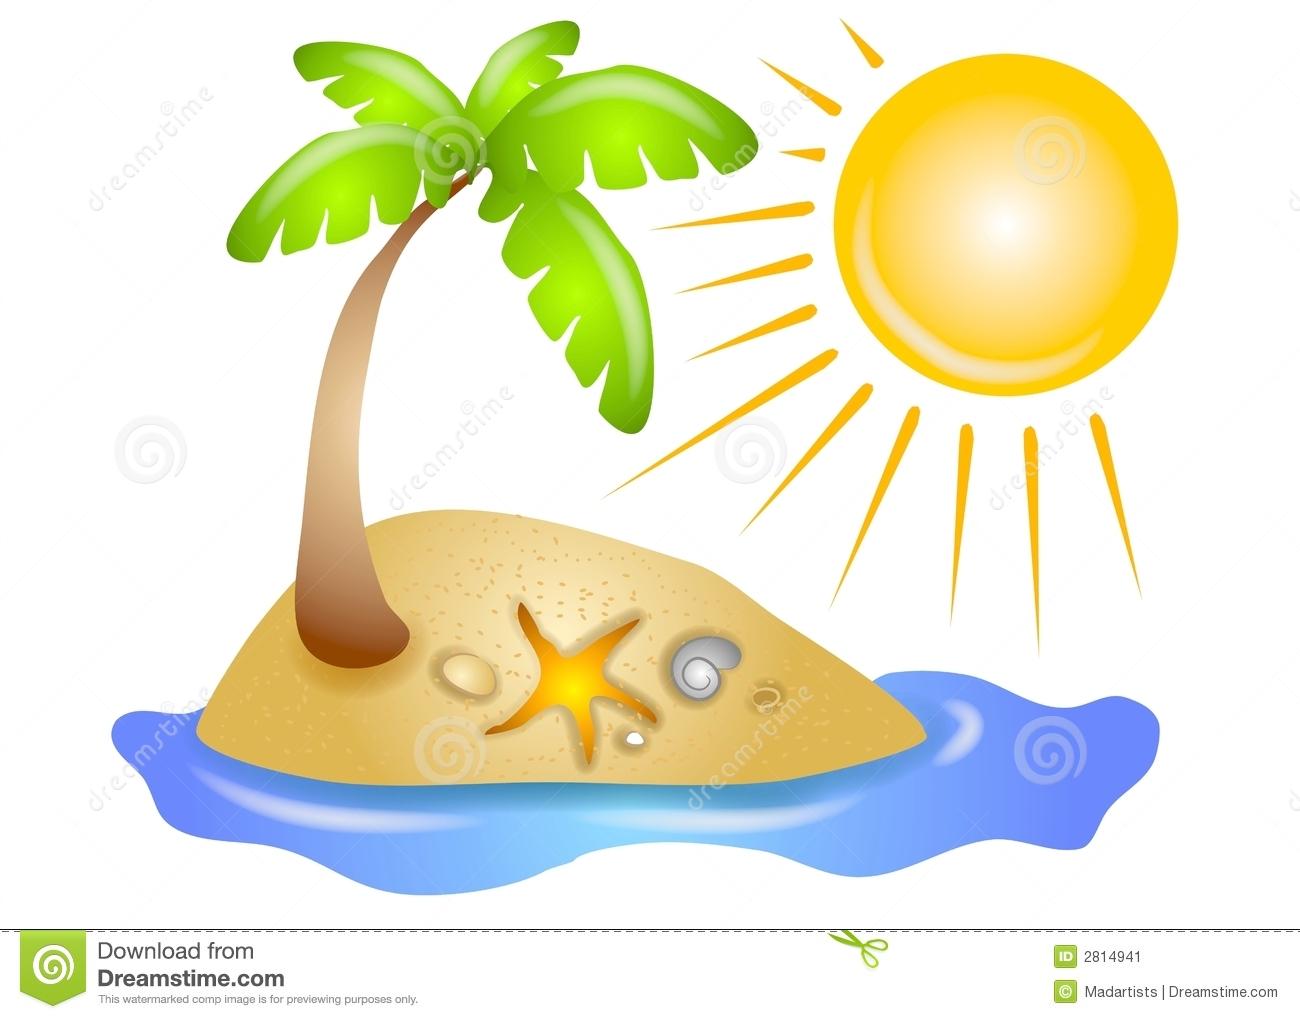 Tree Ona Deserted Island With Beach Shel-Tree Ona Deserted Island With Beach Shells Water And A Glowing Sun-9